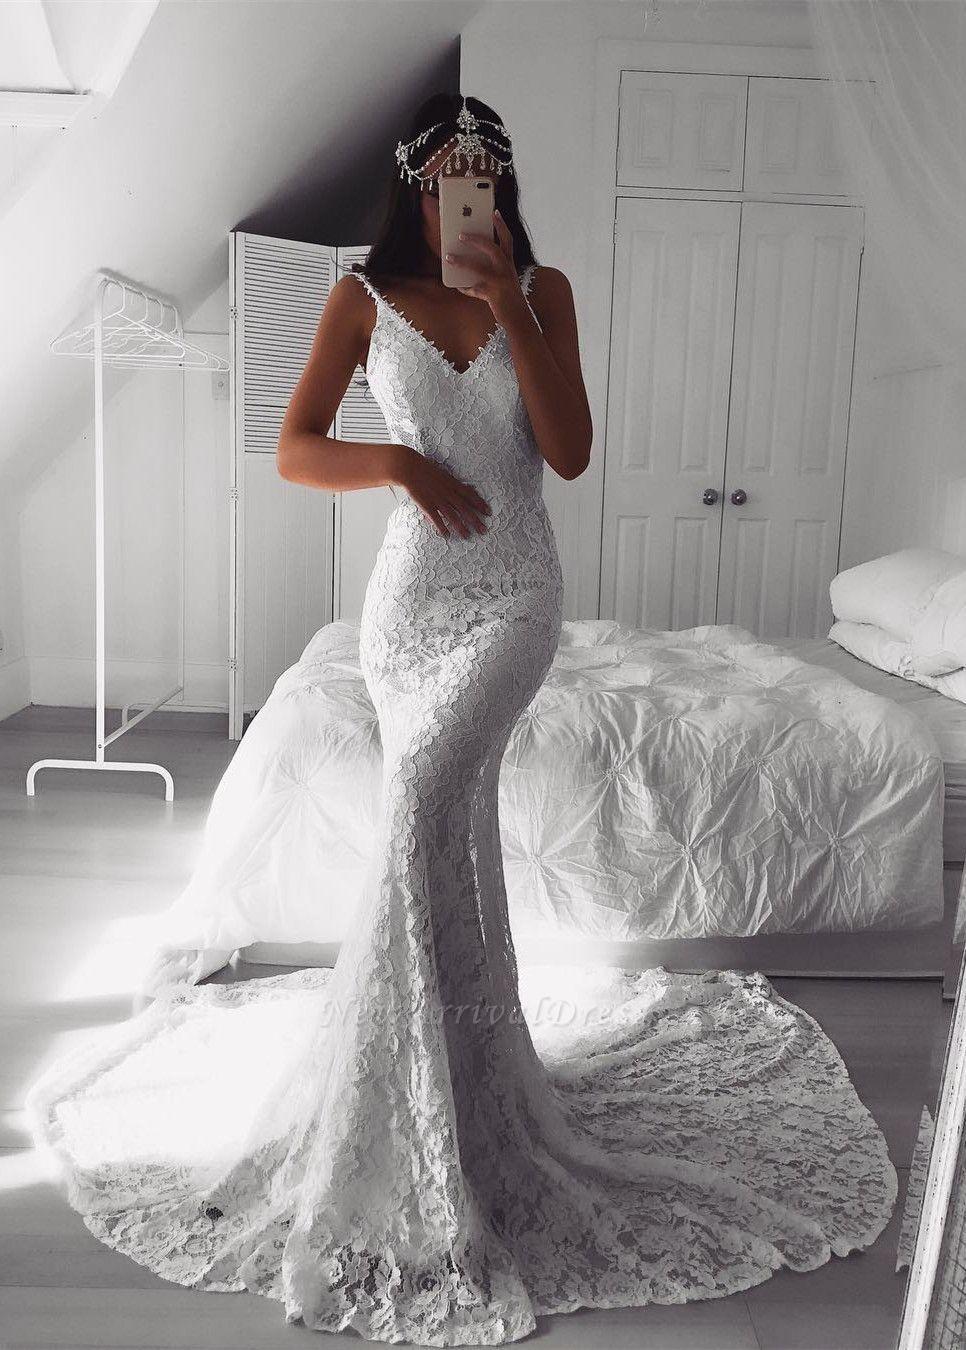 Modern Beautiful Lace V Neck Mermaid Wedding Dresses Custom Made Online Cheap Bridal Gowns Sheer Wedding Dress Bridal Dresses Wedding Dresses [ 1350 x 966 Pixel ]